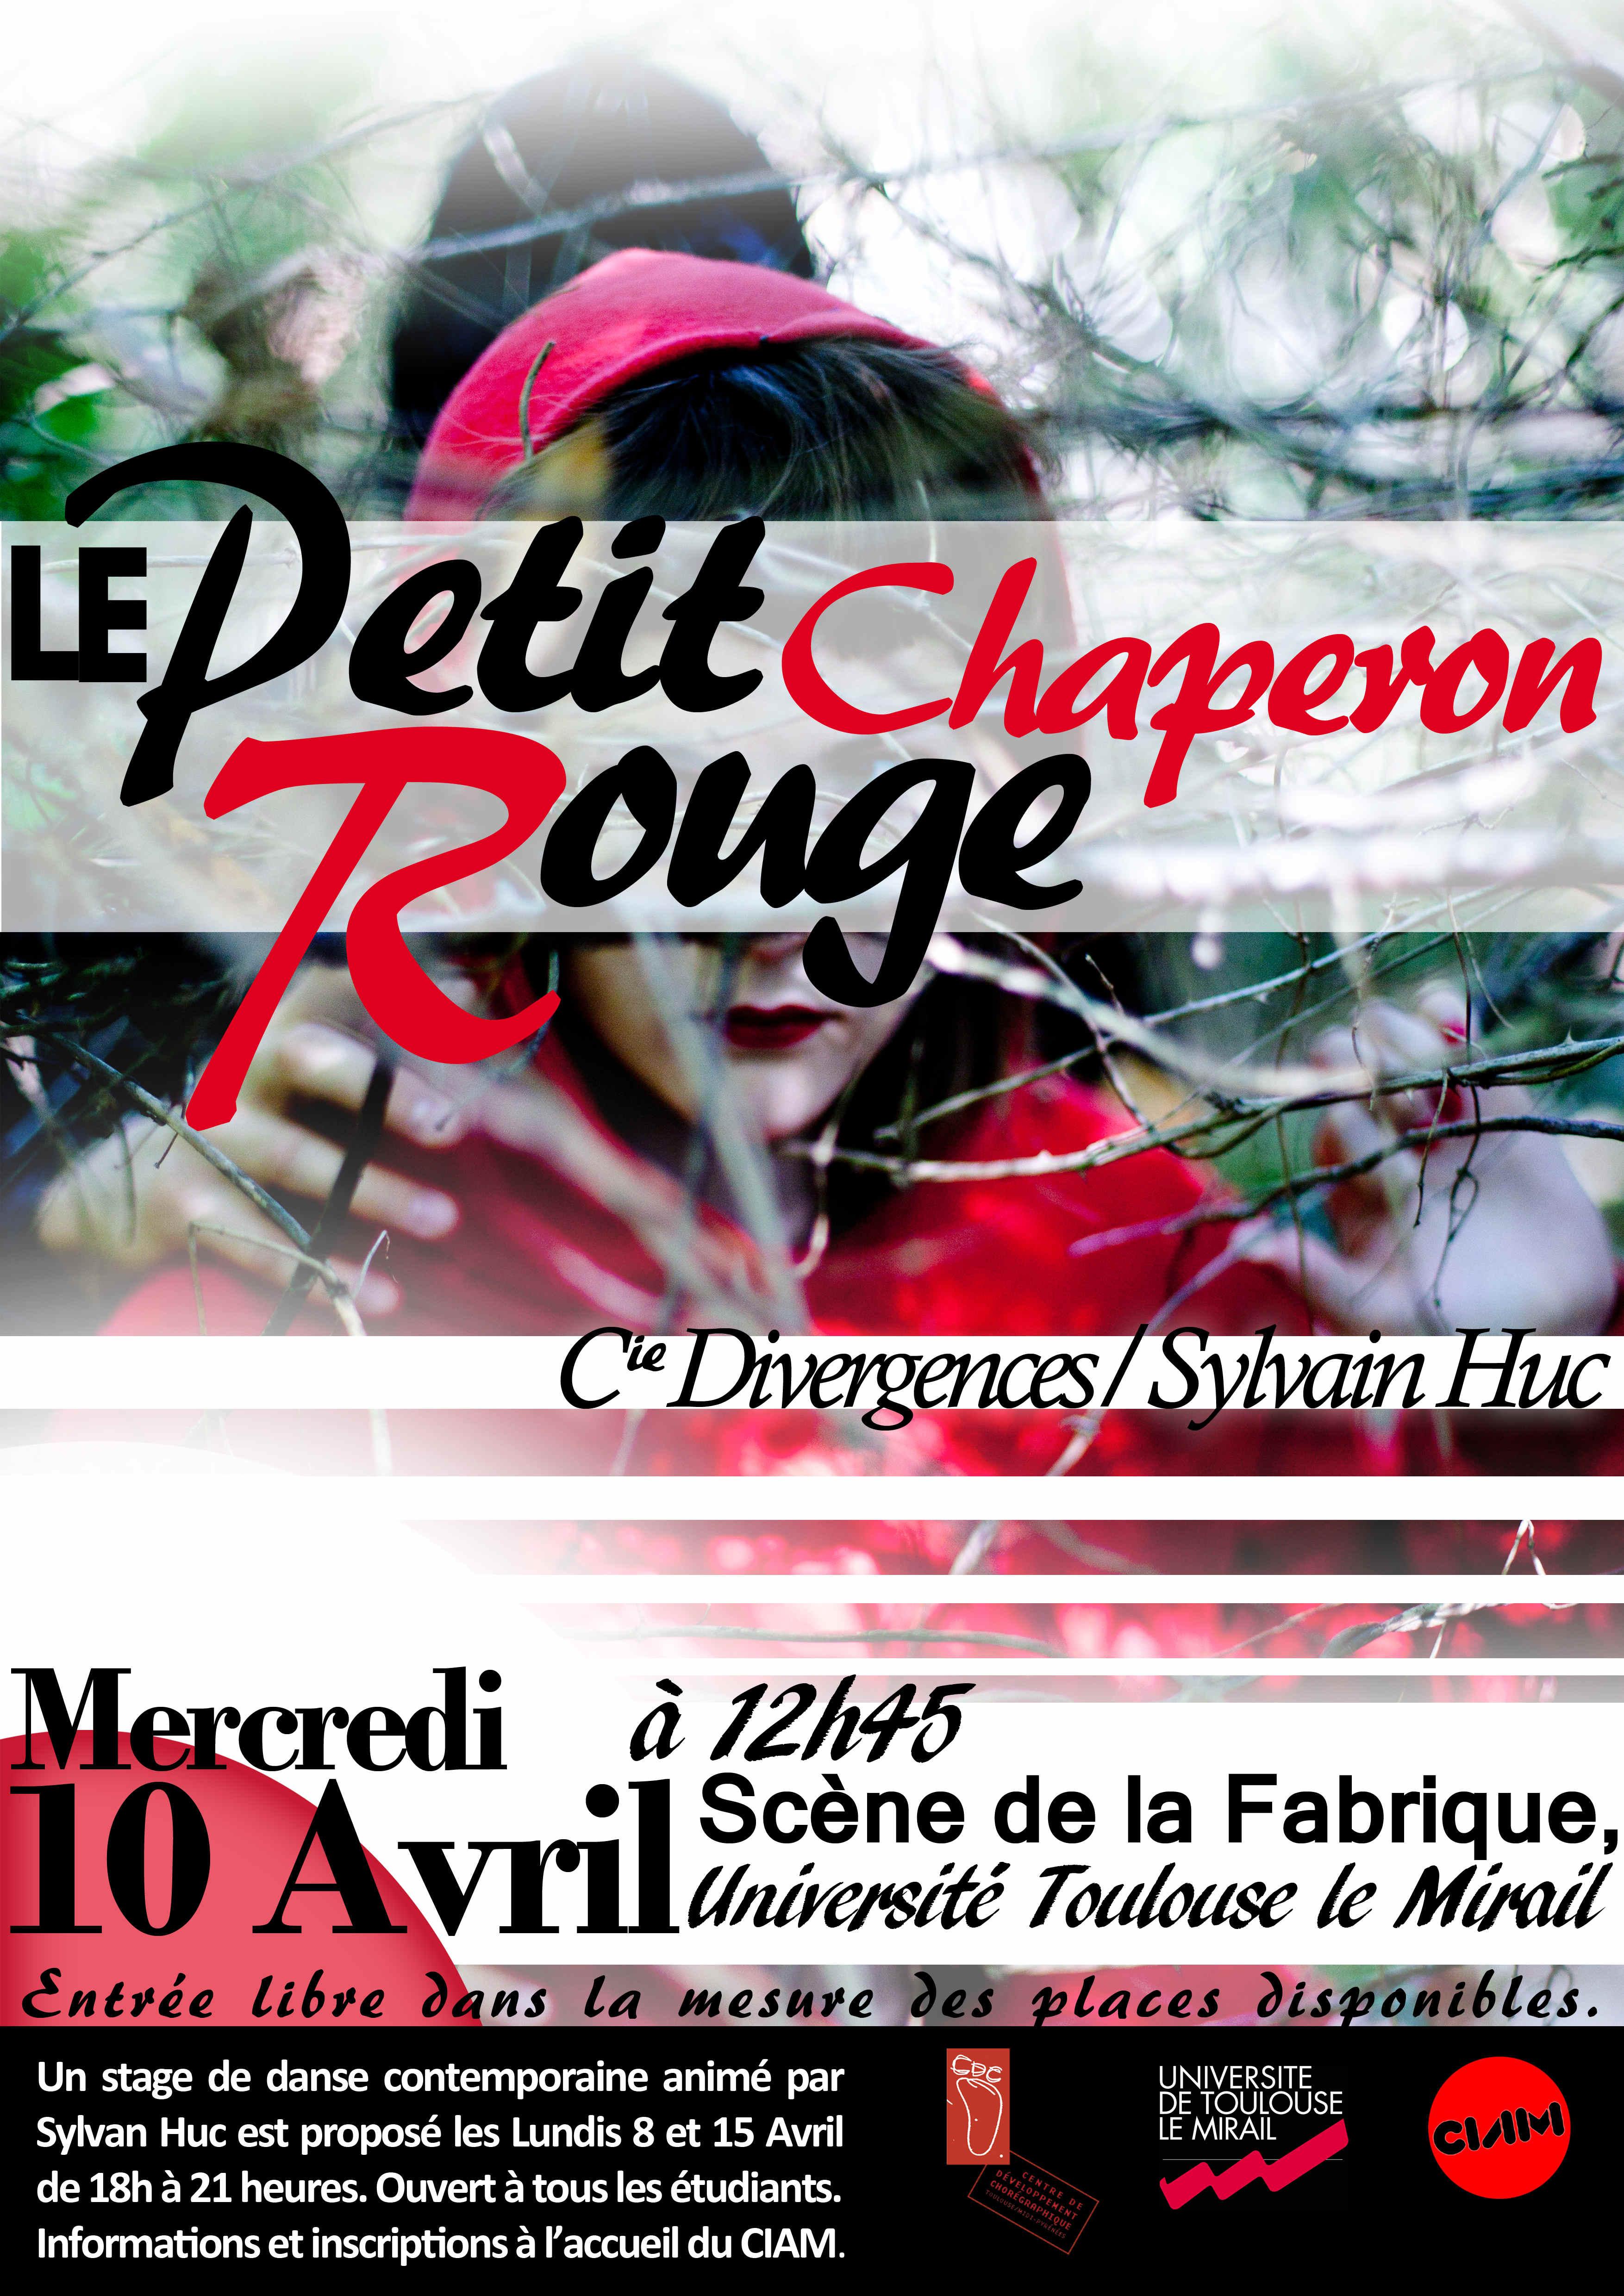 Affiche Petit Chaperon Rouge Mercredi 10 avril 13 .jpg